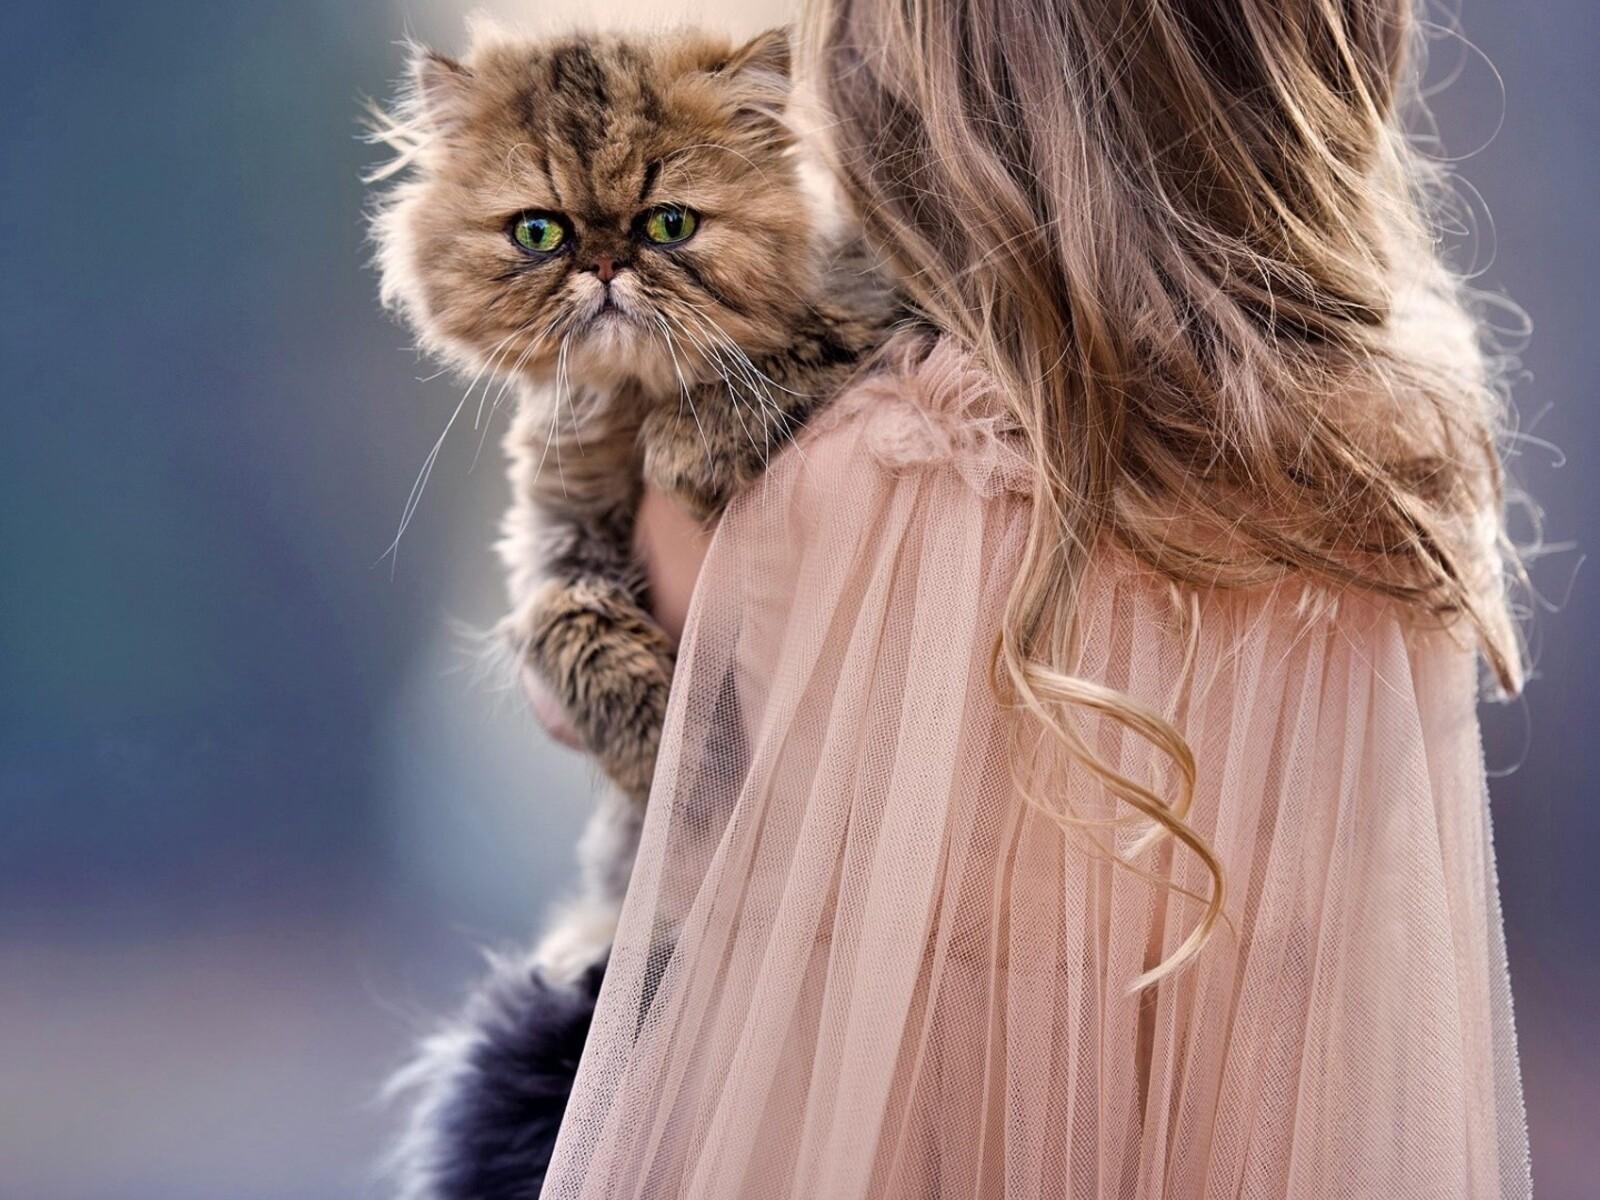 children-and-cat-cute-sd.jpg